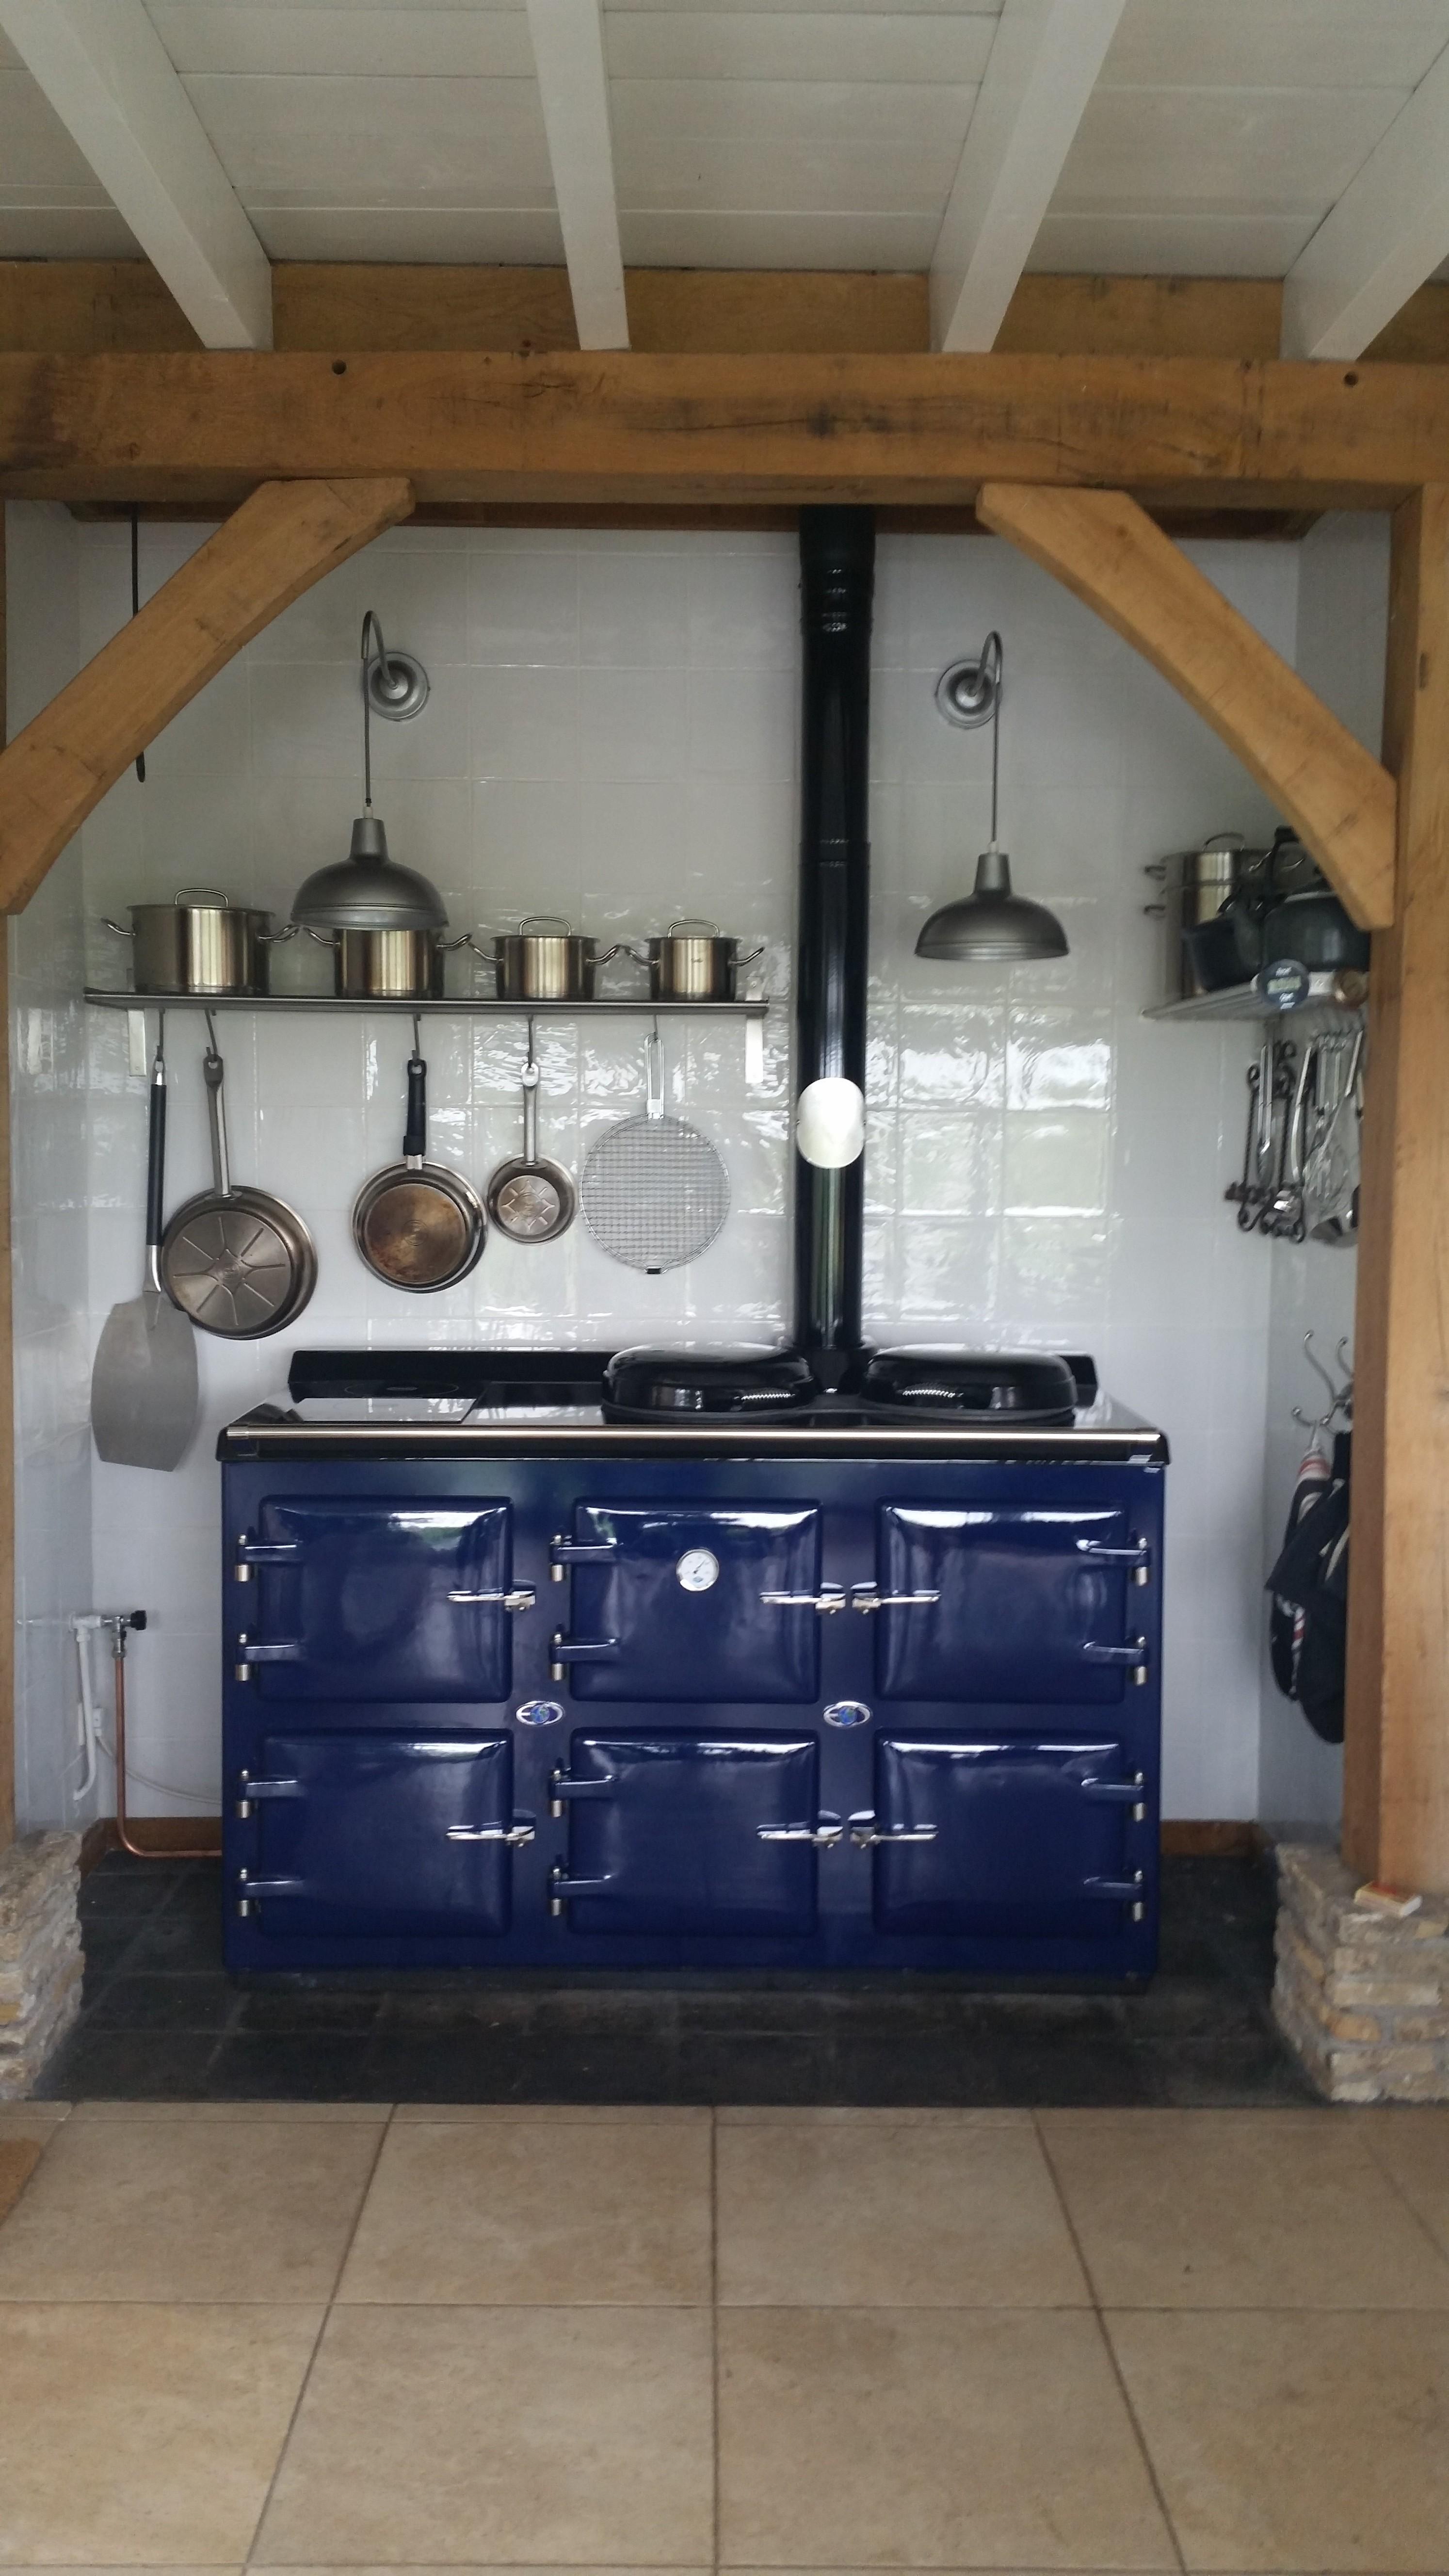 AGA blue 5 oven oil-gas